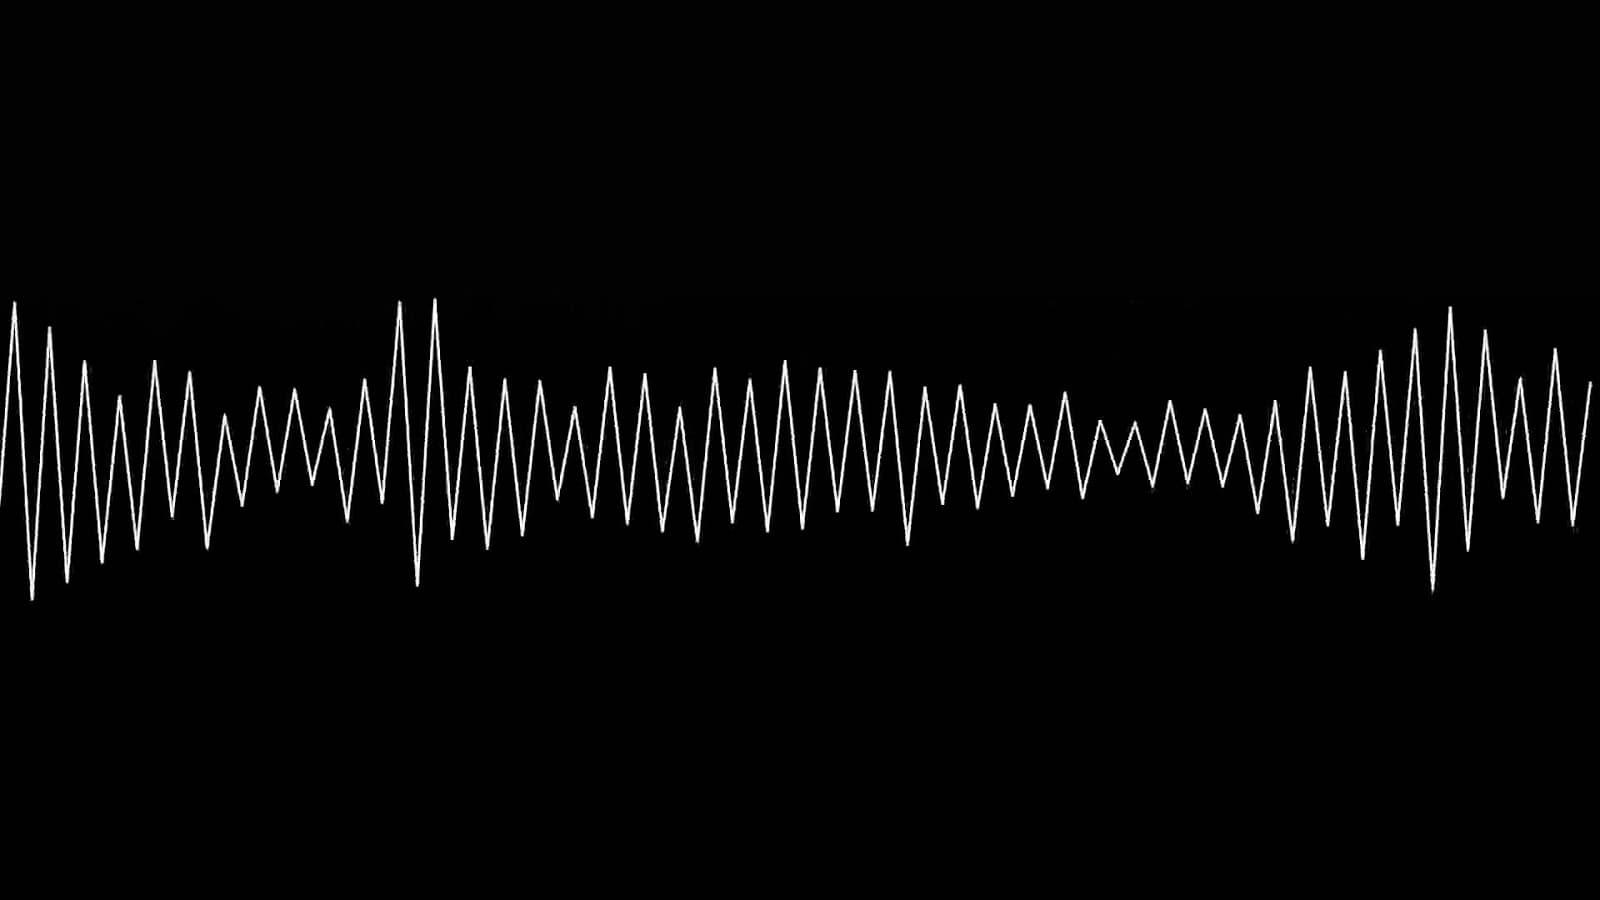 cymatics-fl studio 20-waveform